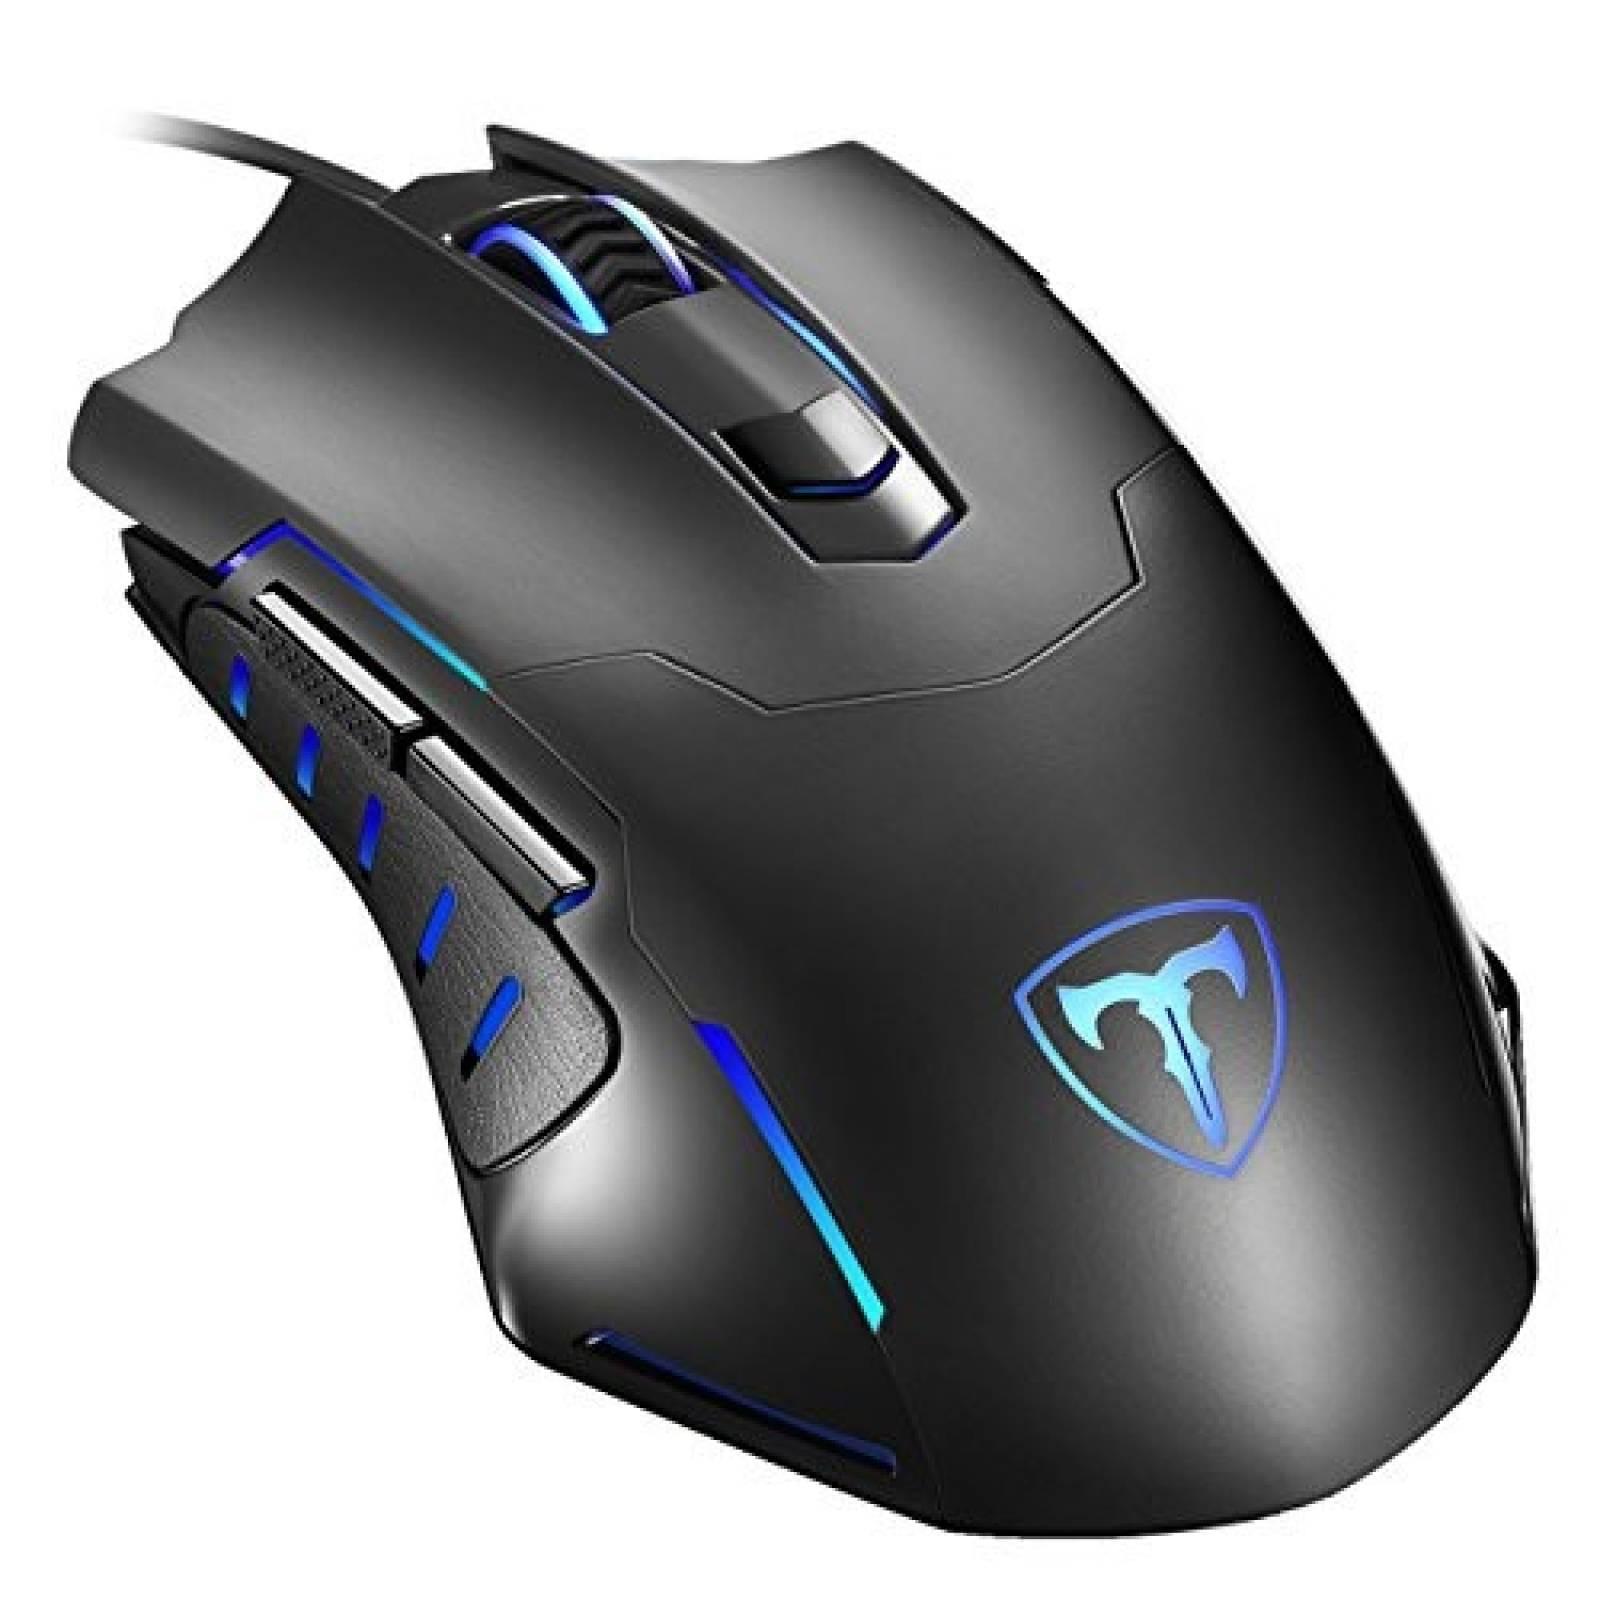 Mouse Gamer PICTEK 7200 DPI 3200DPI -Negro